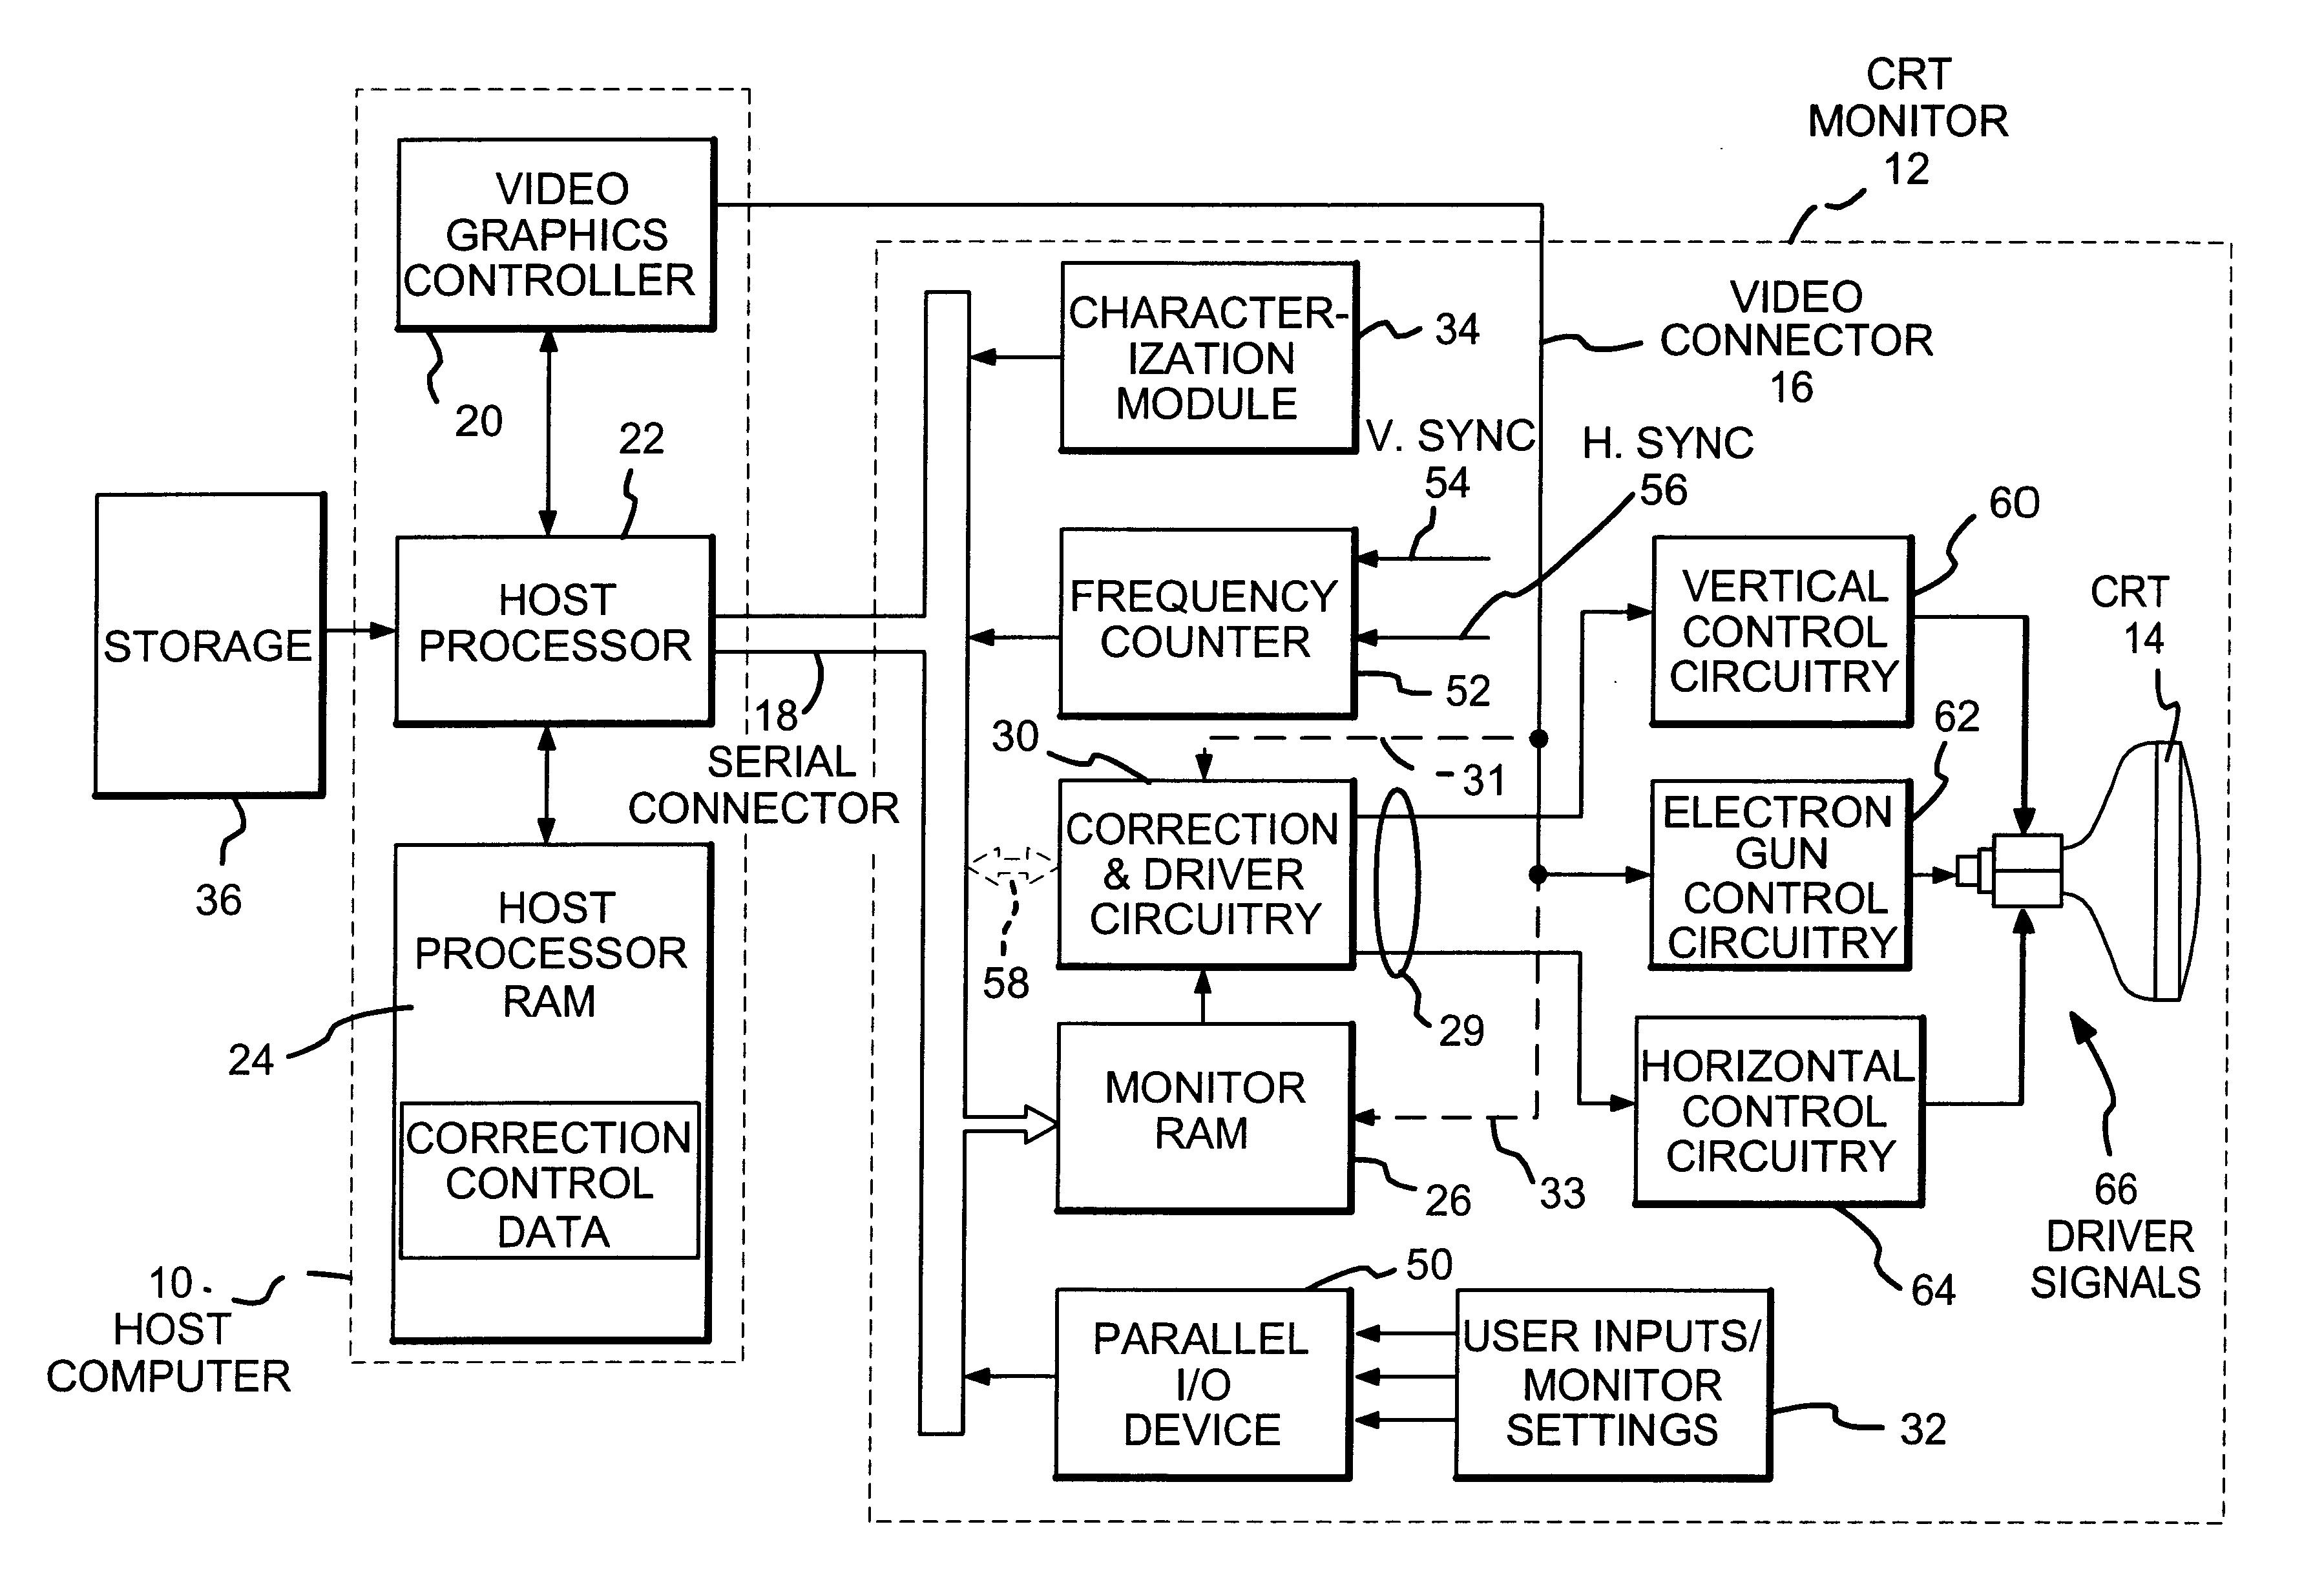 medium resolution of crt wiring diagram wiring diagram centre crt monitor wiring diagram component crt block diagram g6 electronics